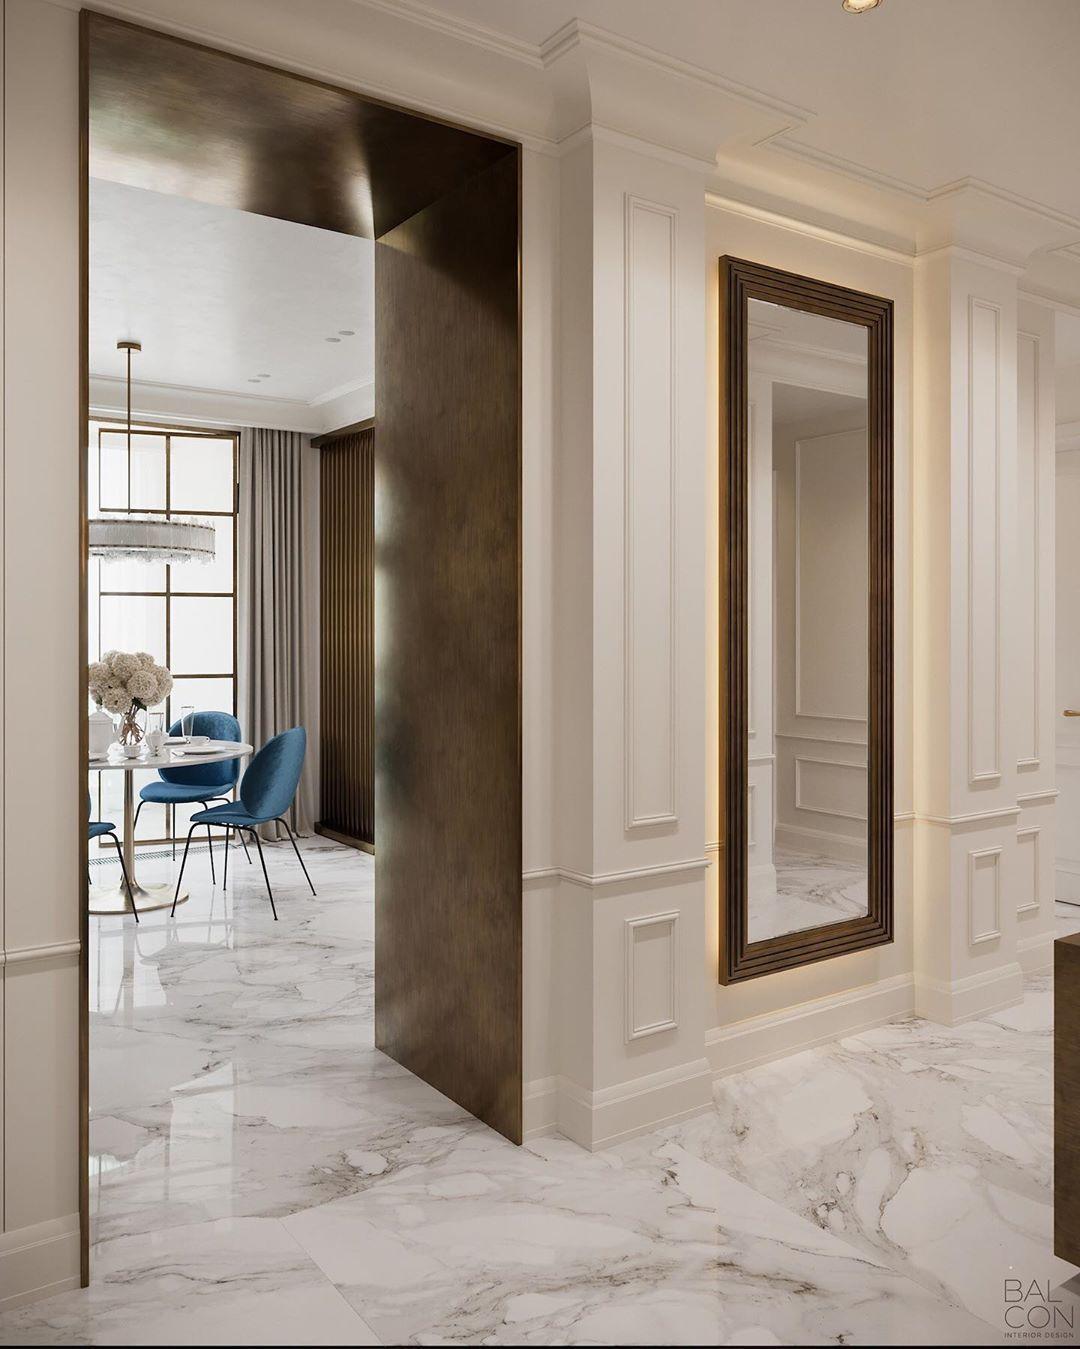 Dizajn Interera Balcon On Instagram Dizajn Koridora 15 Kv